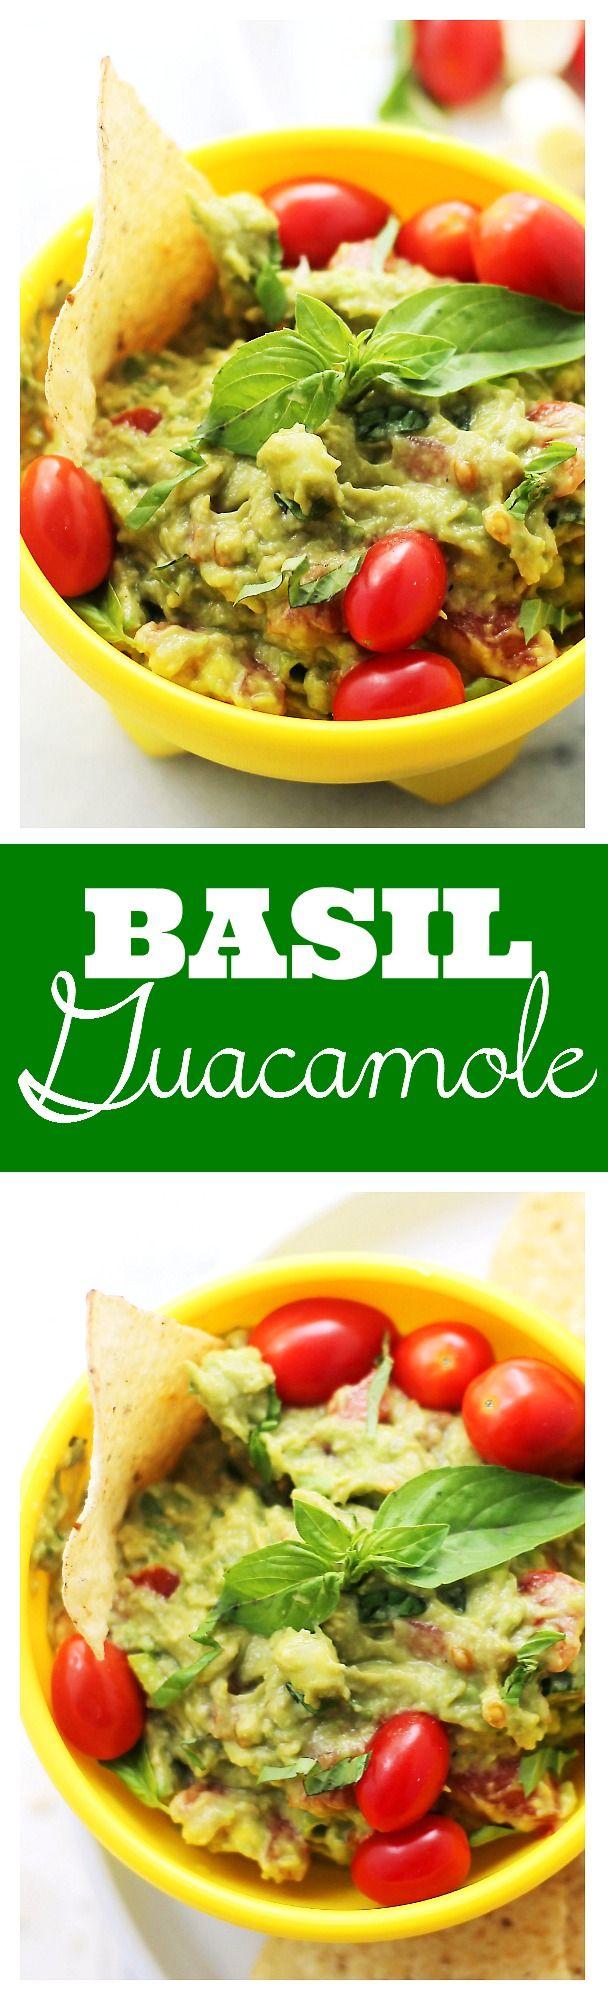 Basil Guacamole Recipe